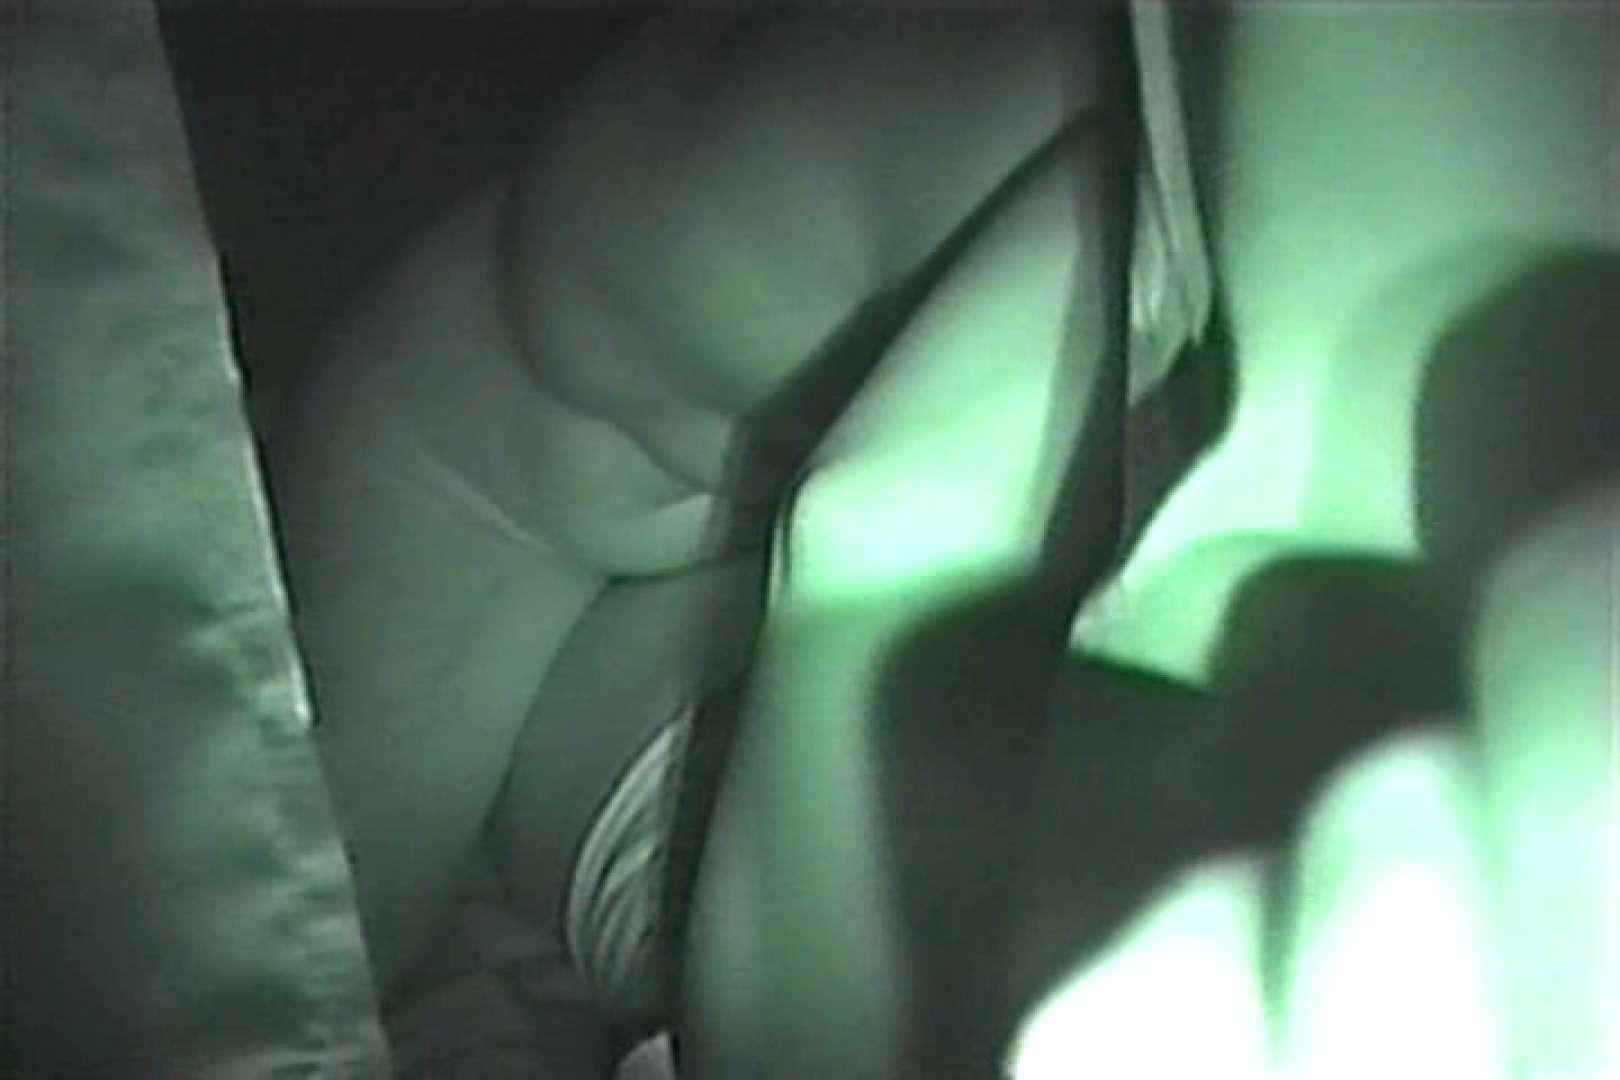 MASAさんの待ち伏せ撮り! 赤外線カーセックスVol.11 お姉さん丸裸 ワレメ無修正動画無料 77pic 38